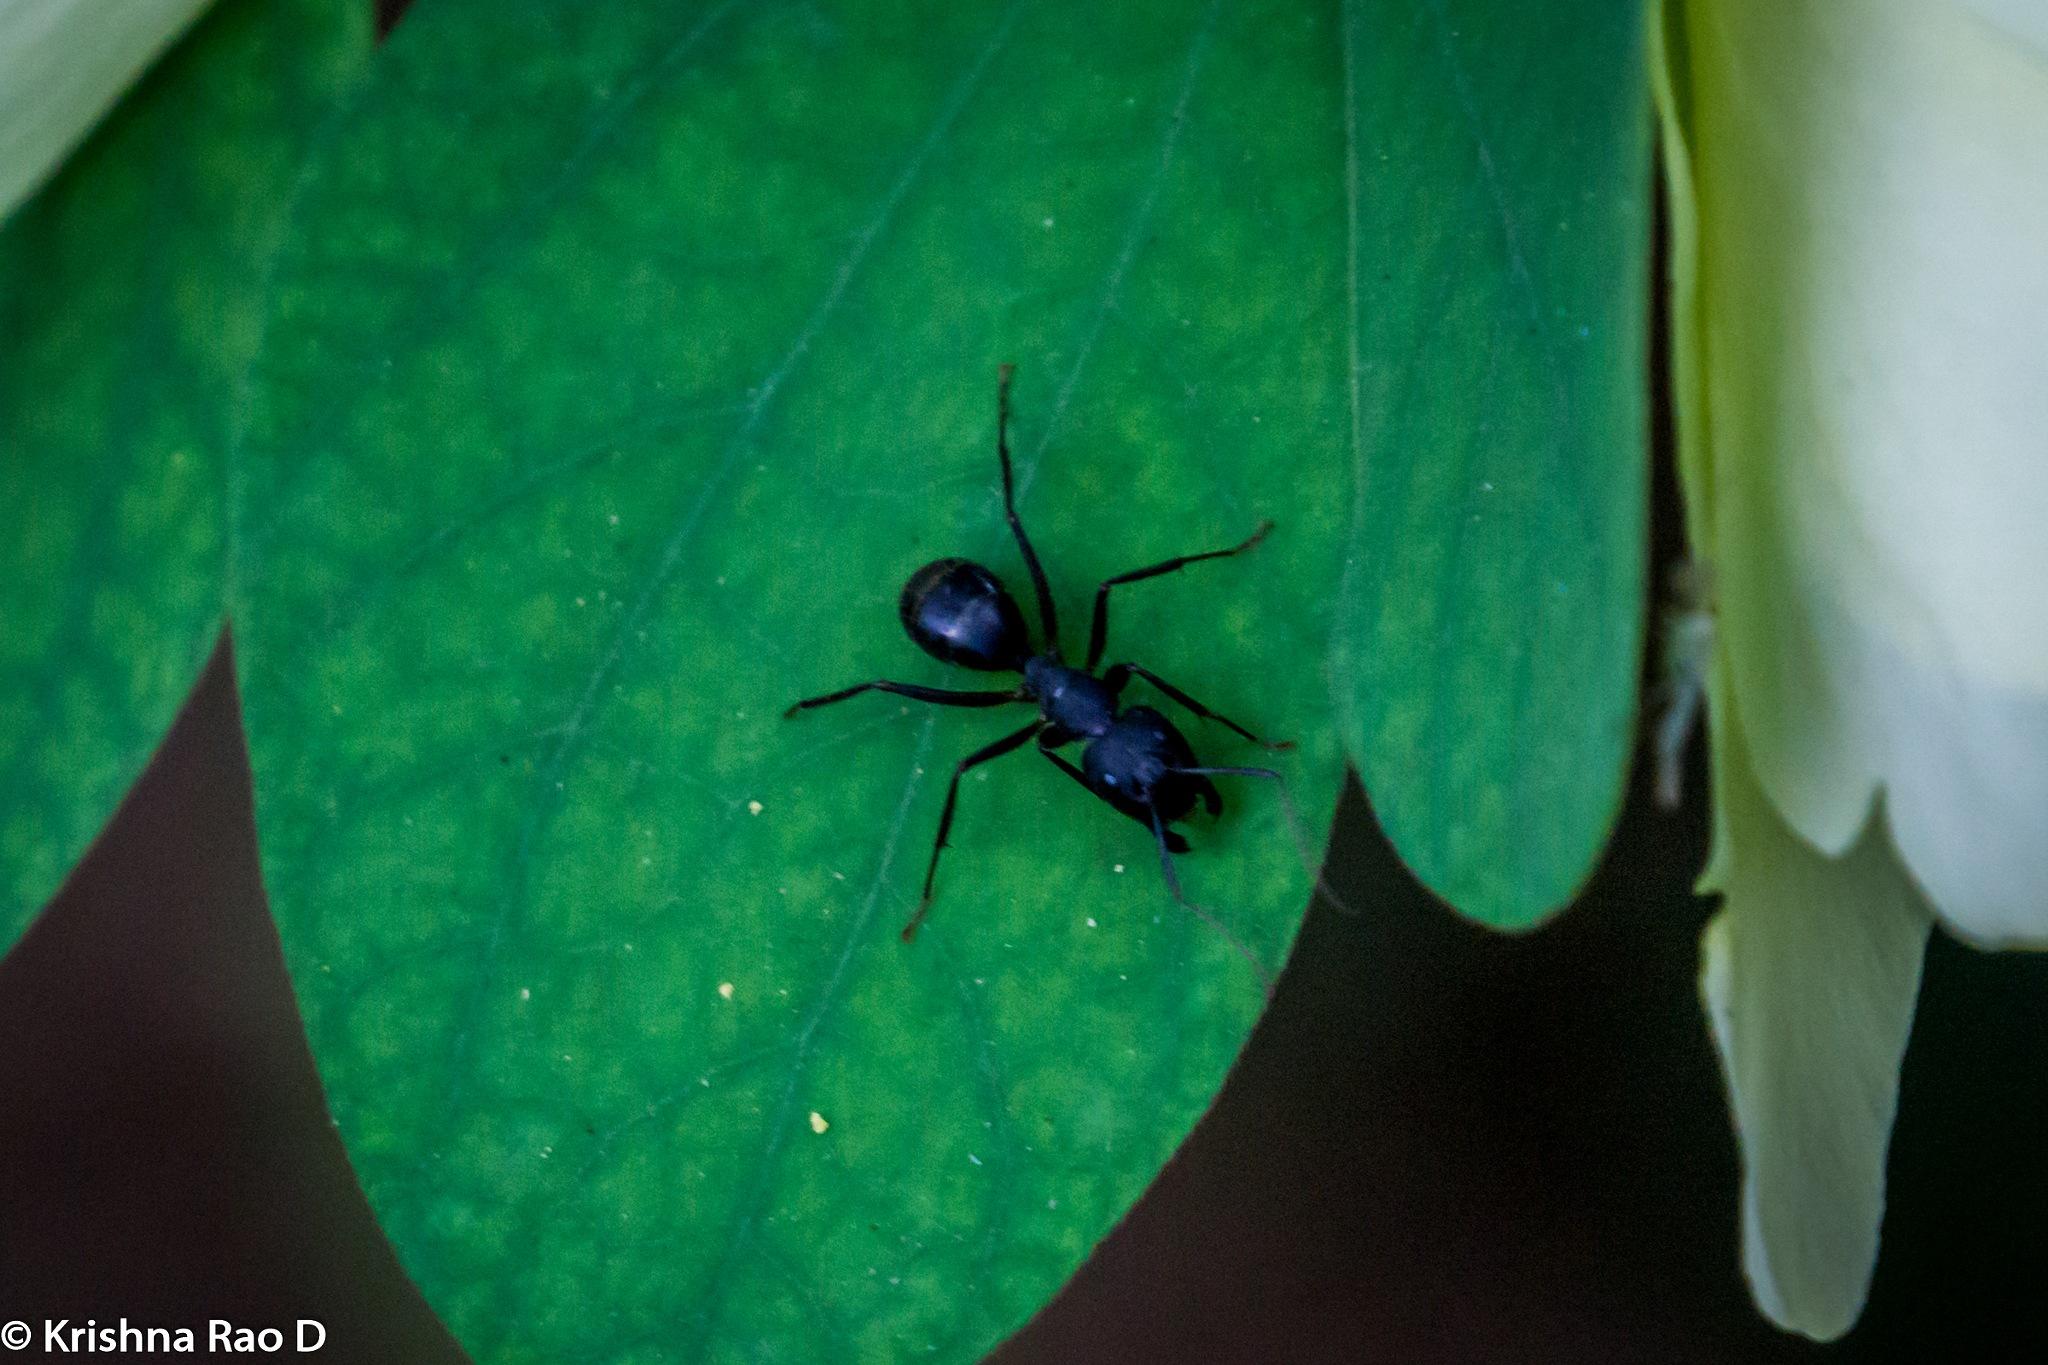 ant by Krishna Rao D